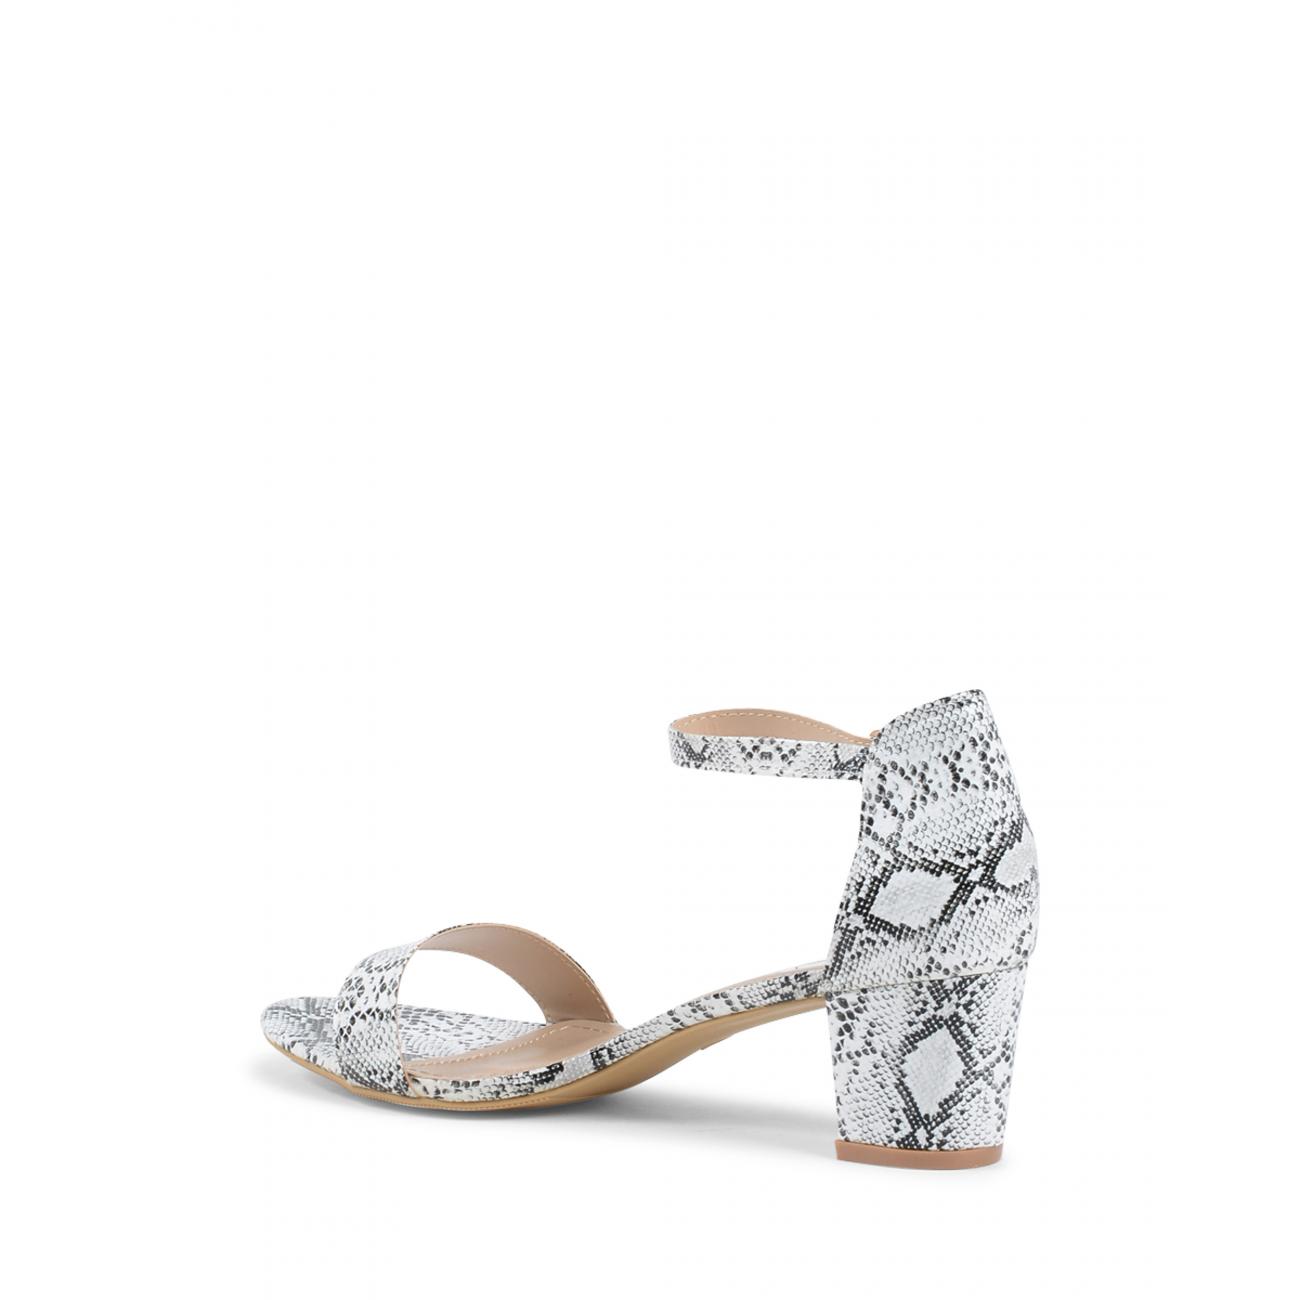 19V69 Italia Women's Ankle Strap Sandal White V173 WHITE